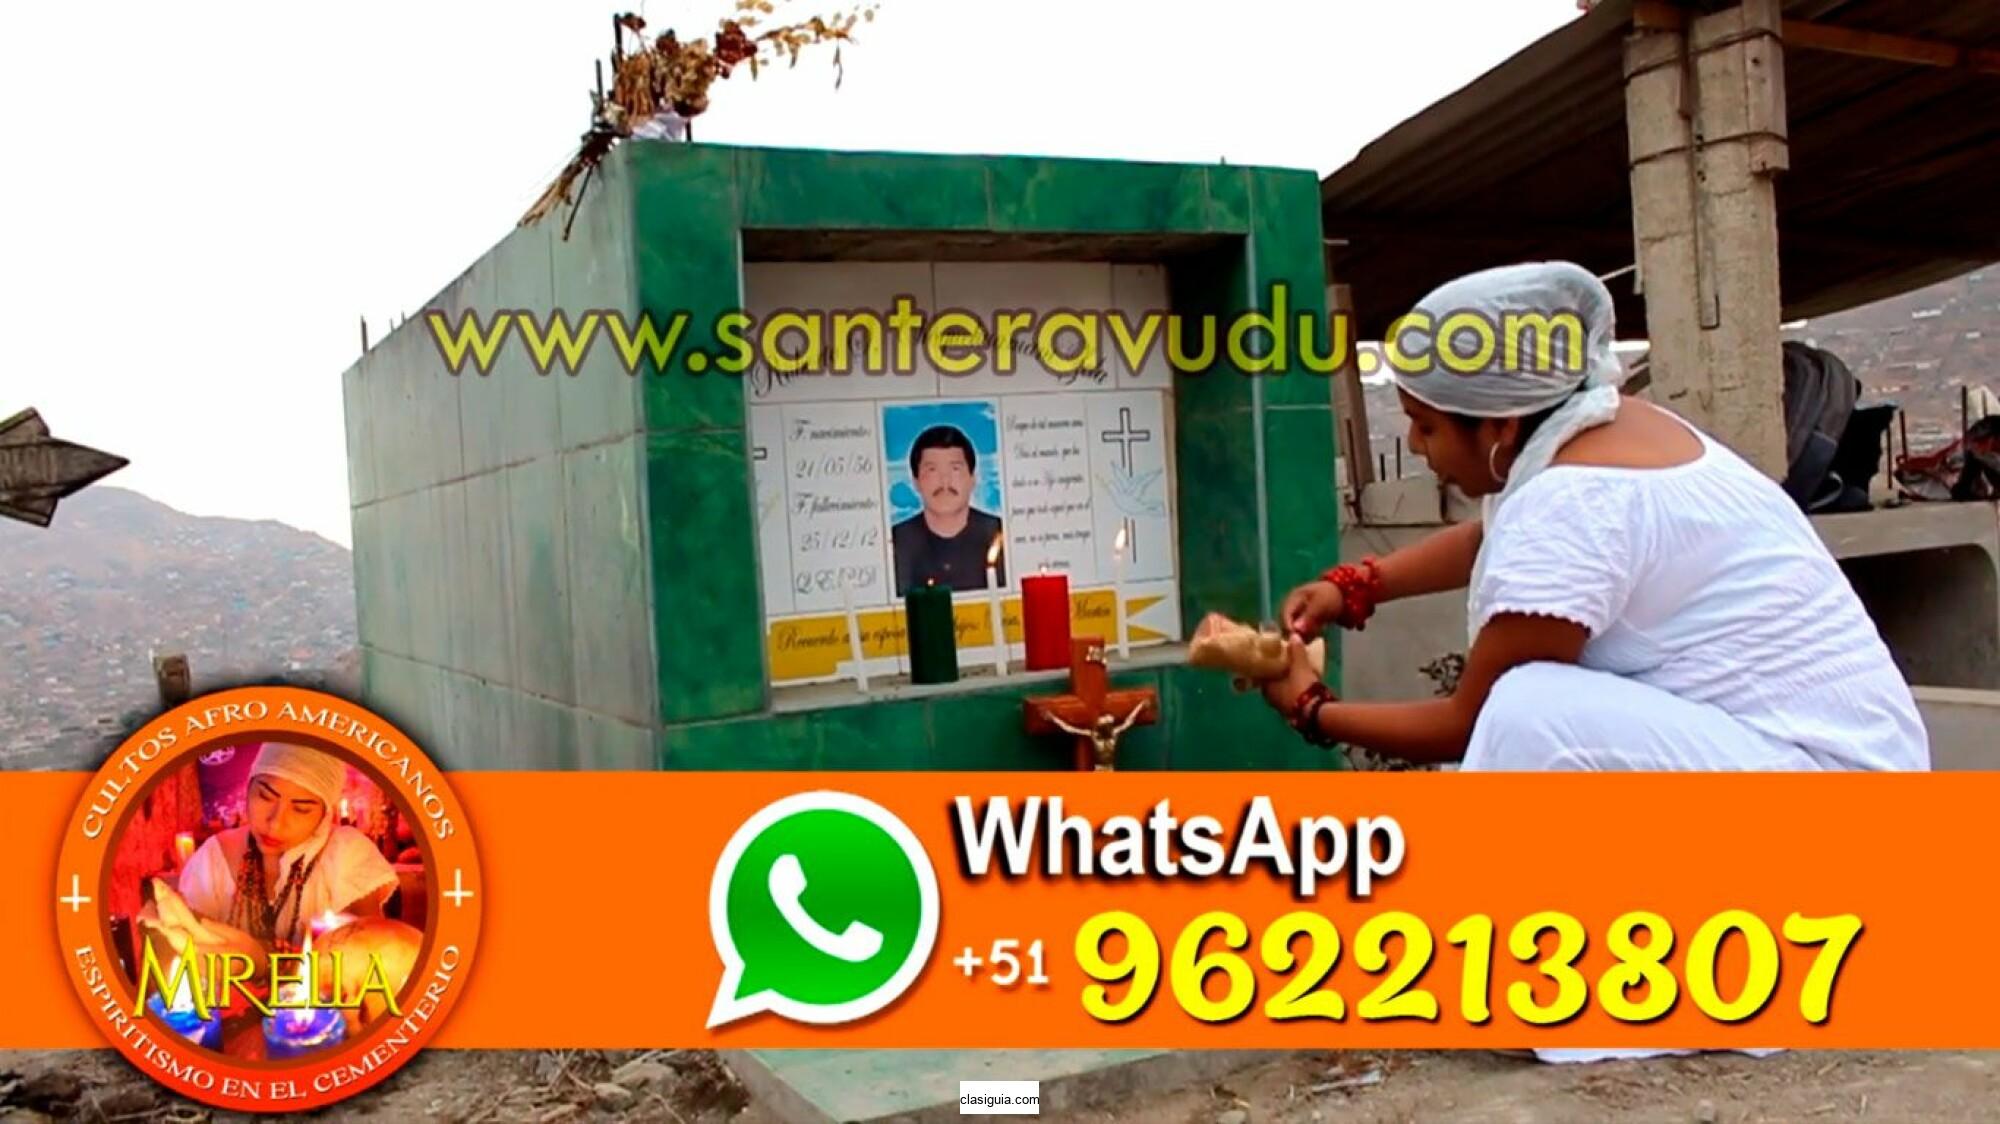 SANTERA VUDU MIRELLA  962213807